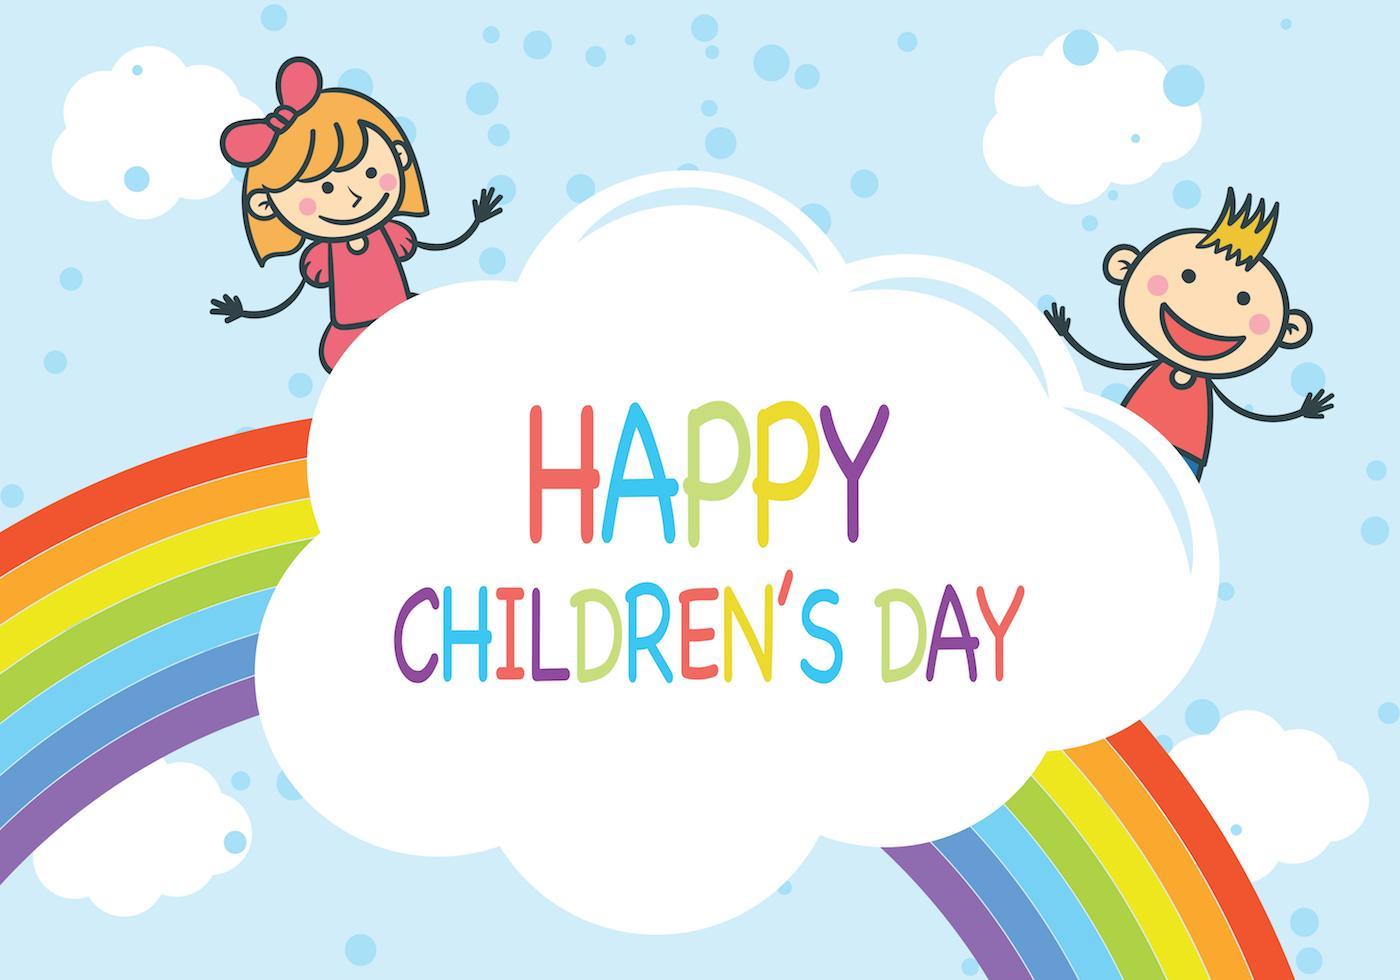 dlf celebrate childrens day - HD1400×980